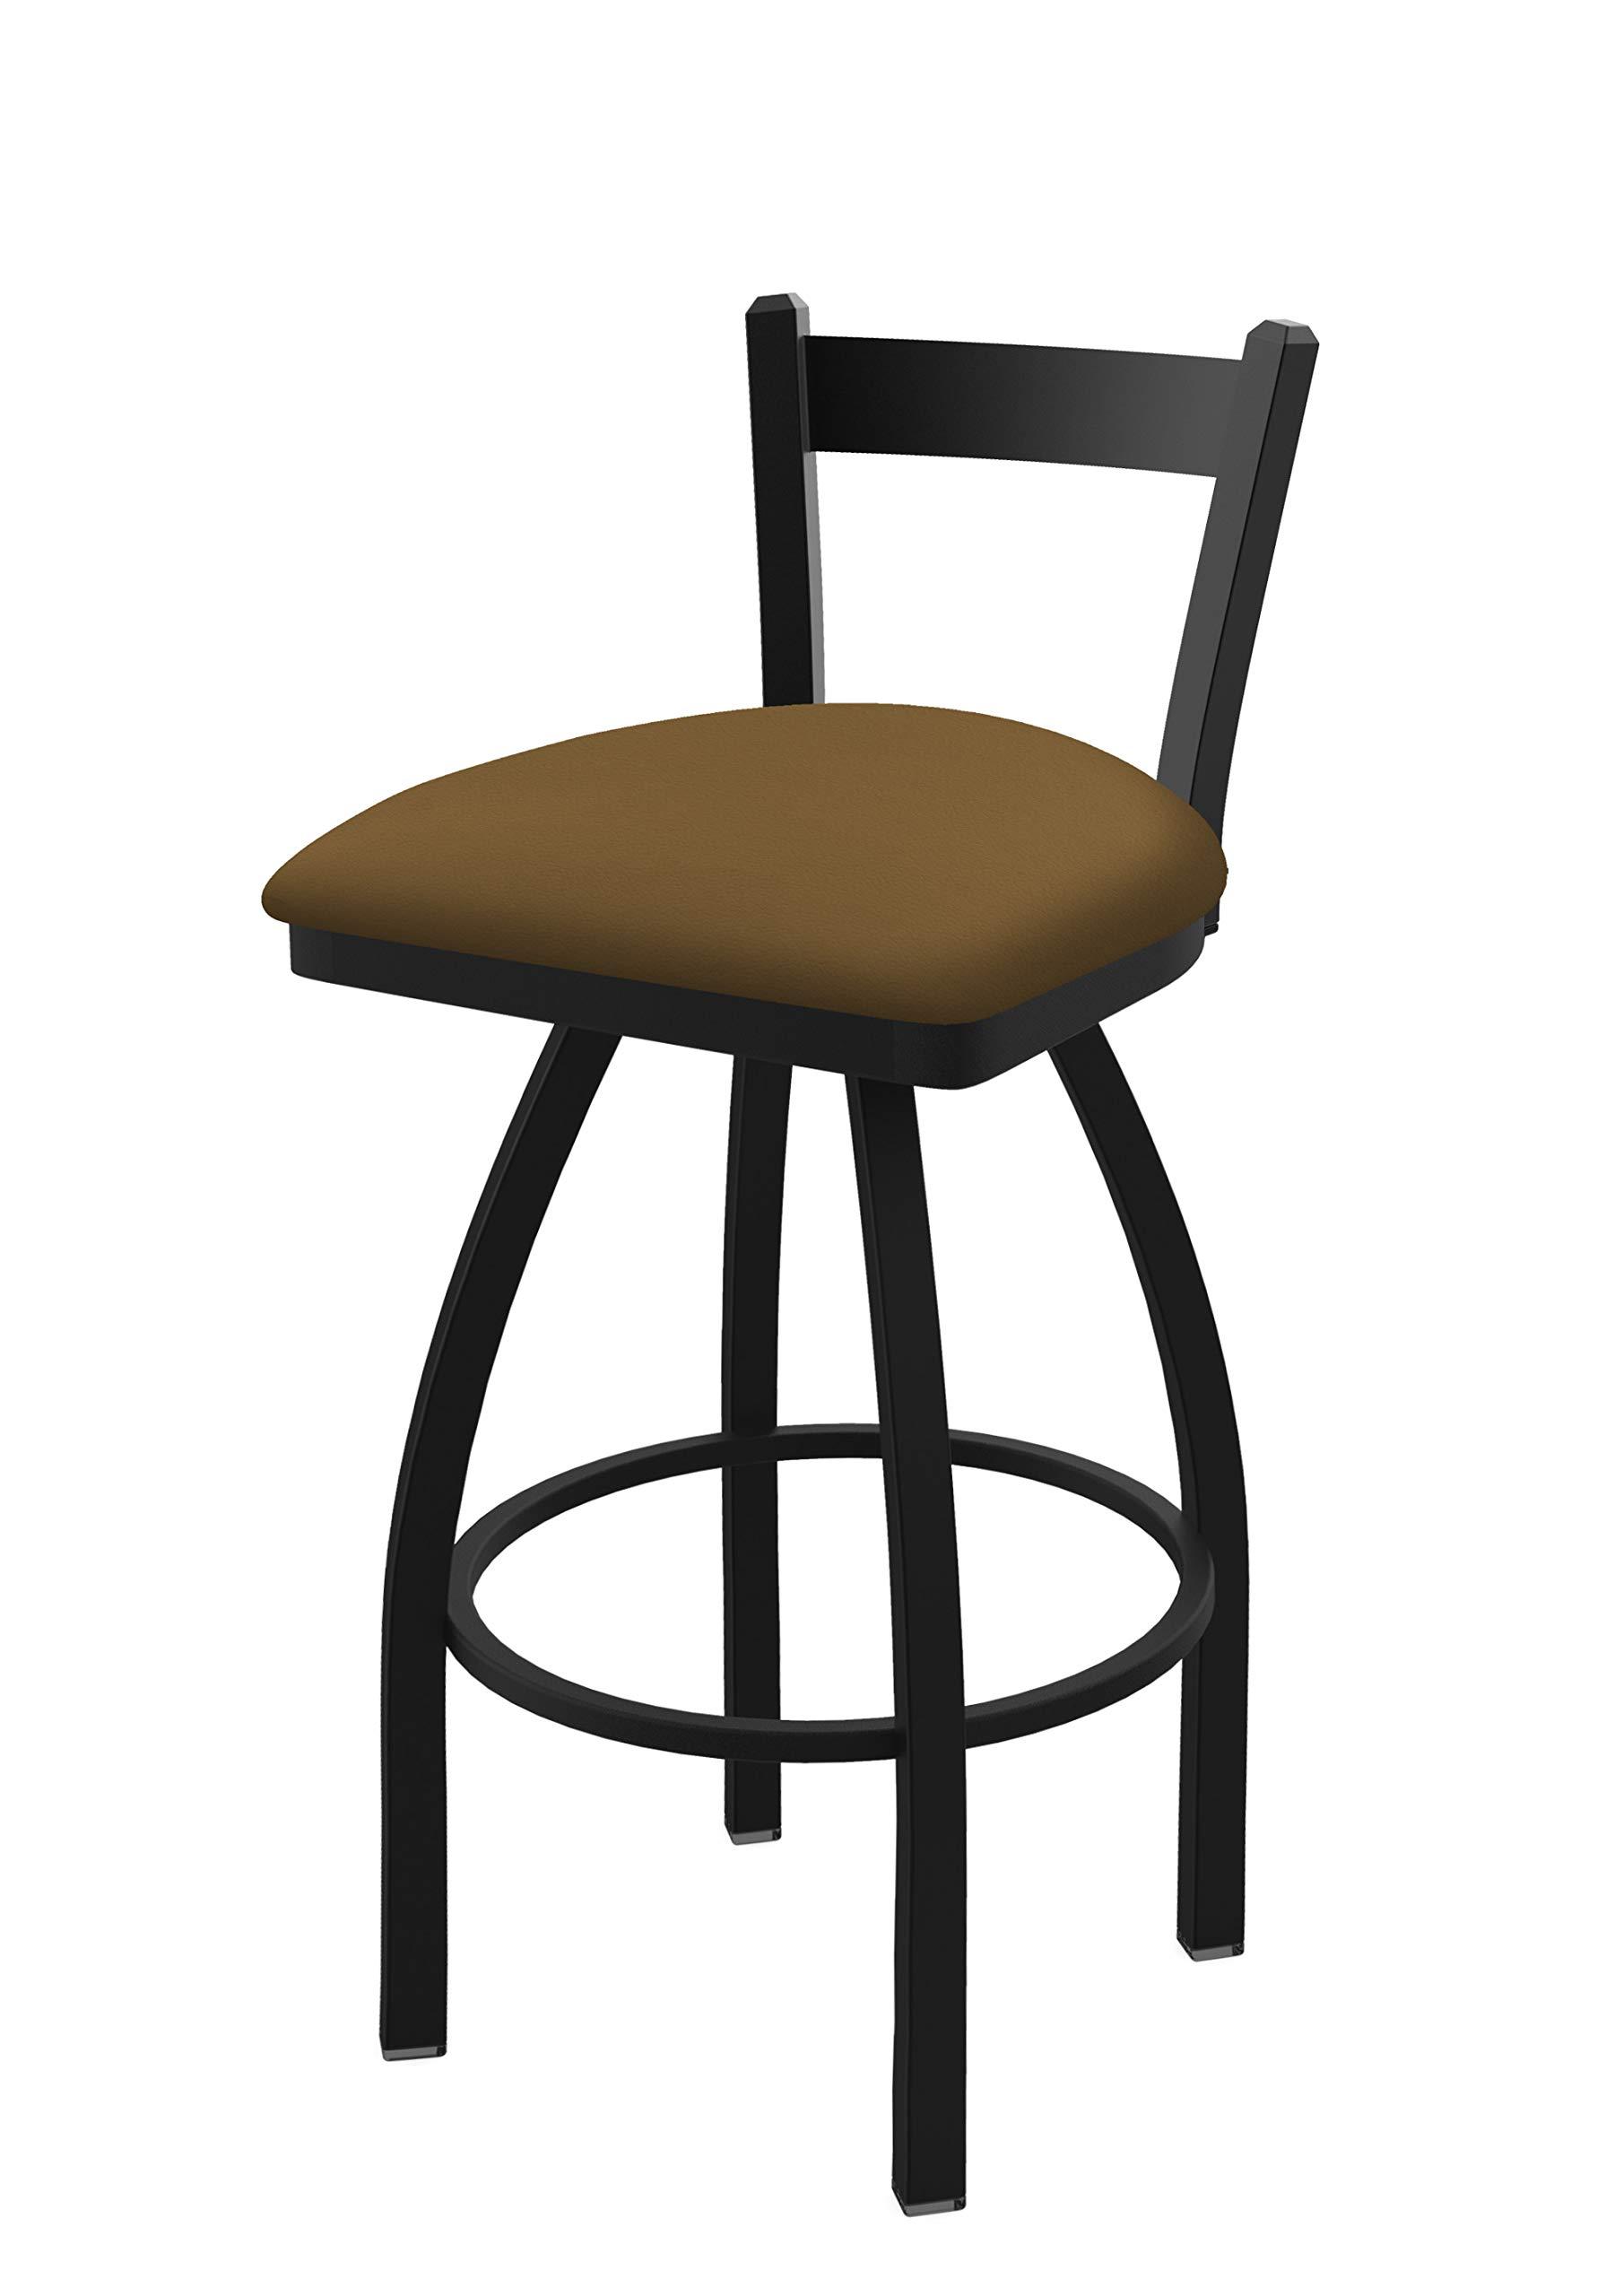 Holland Bar Stool Co. 82125BW012 821 Catalina 25'' Low Back Swivel Counter Black Wrinkle Finish and Canter Saddle Seat Bar Stool